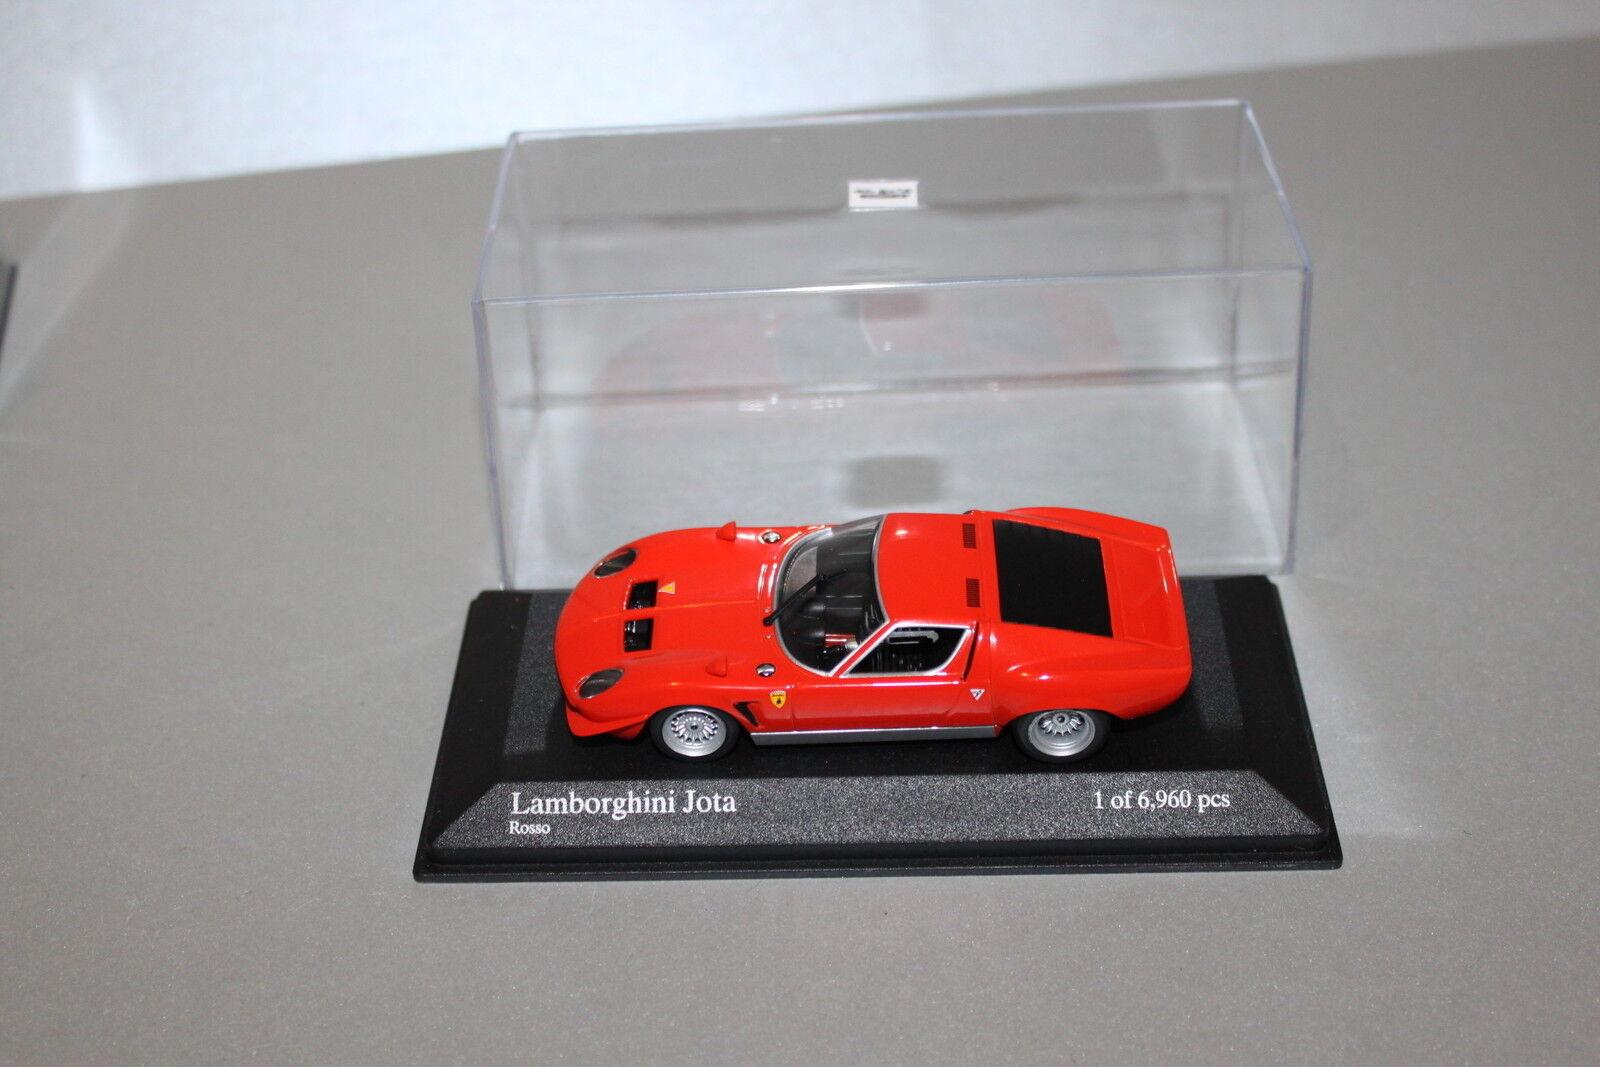 Minichamps Lamborghini Jota rouge limitée 1 43 en vitrine